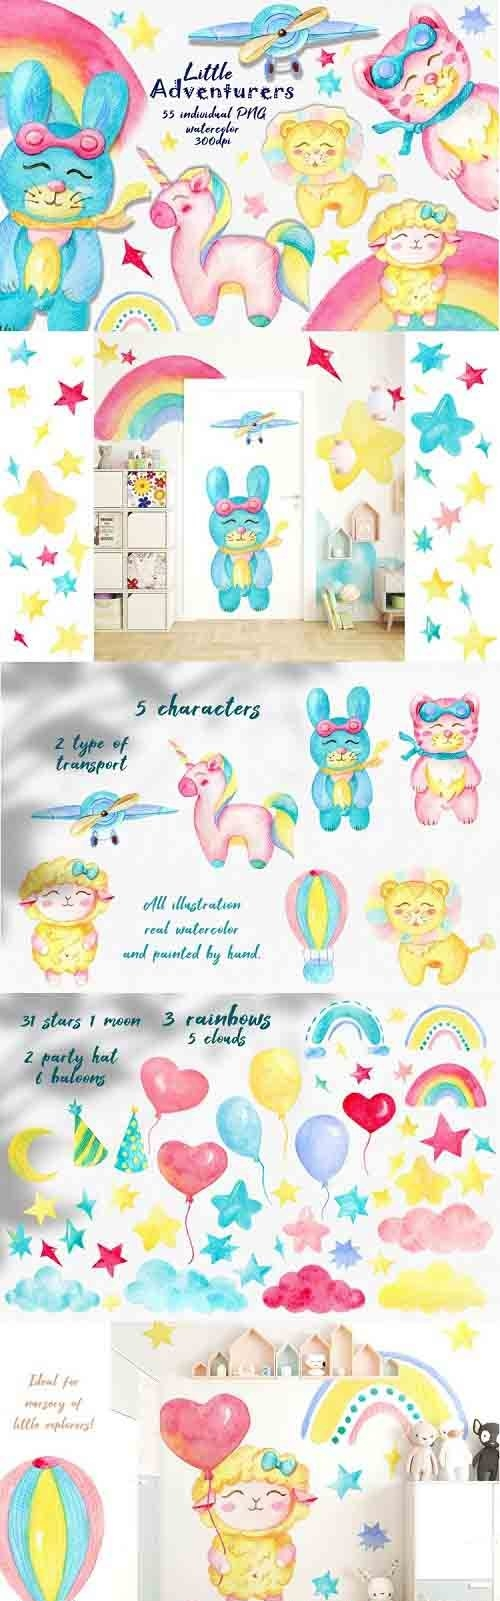 Watercolor kids clipart, Unicorn clipart, Cute Baby animals - 1249287